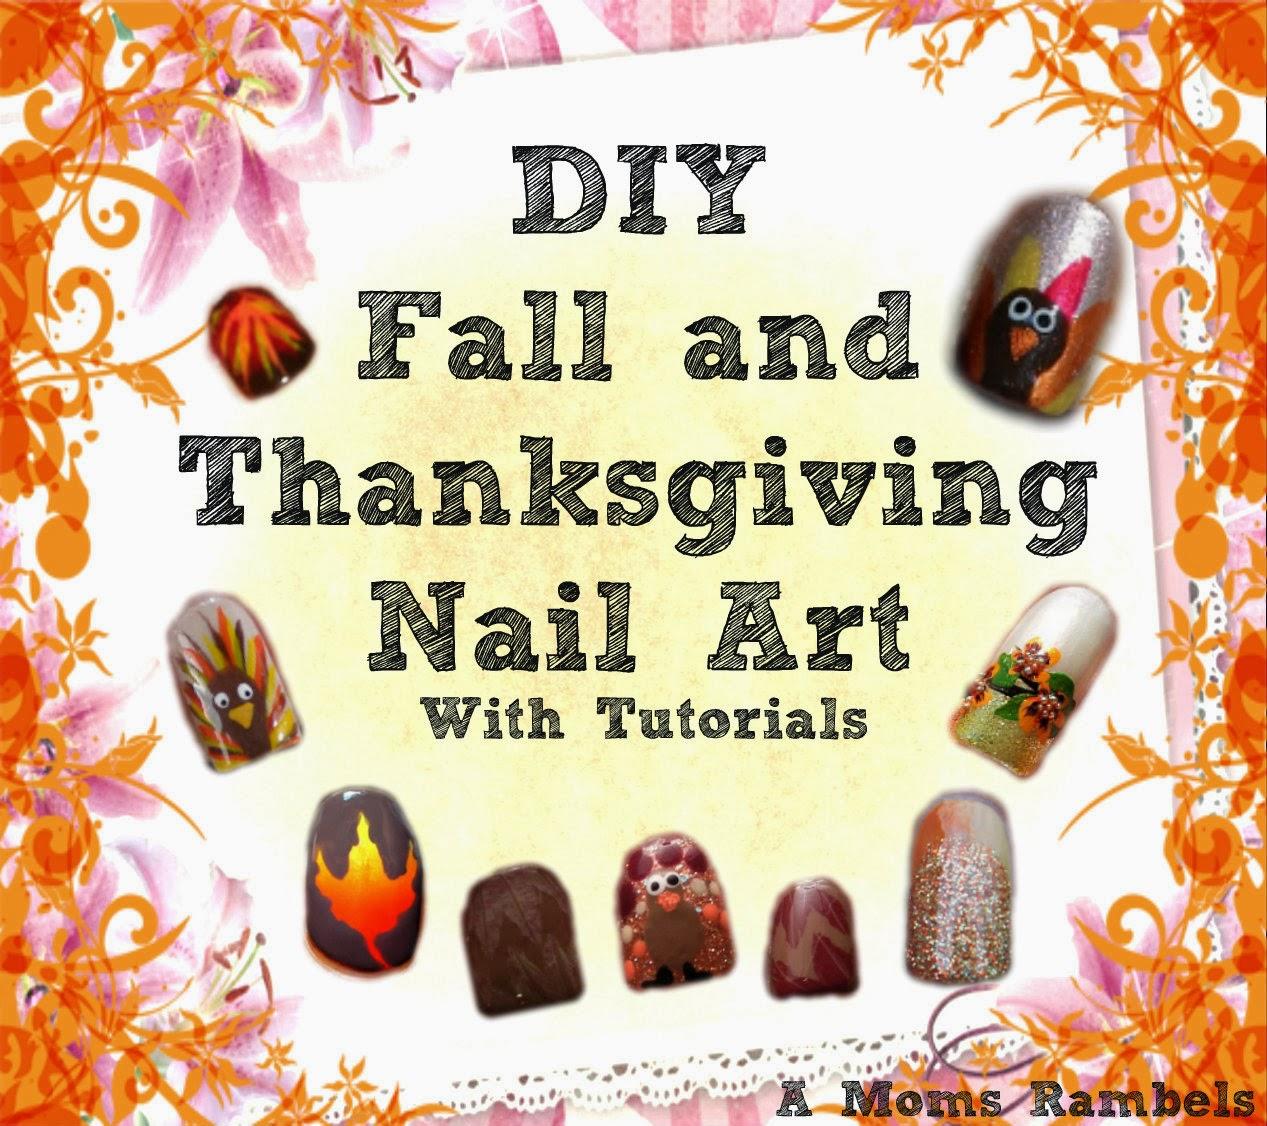 Diy Autumn Gradient Nail Art: A Mom's Rambles: DIY Fall/Thanksgiving Nail Art